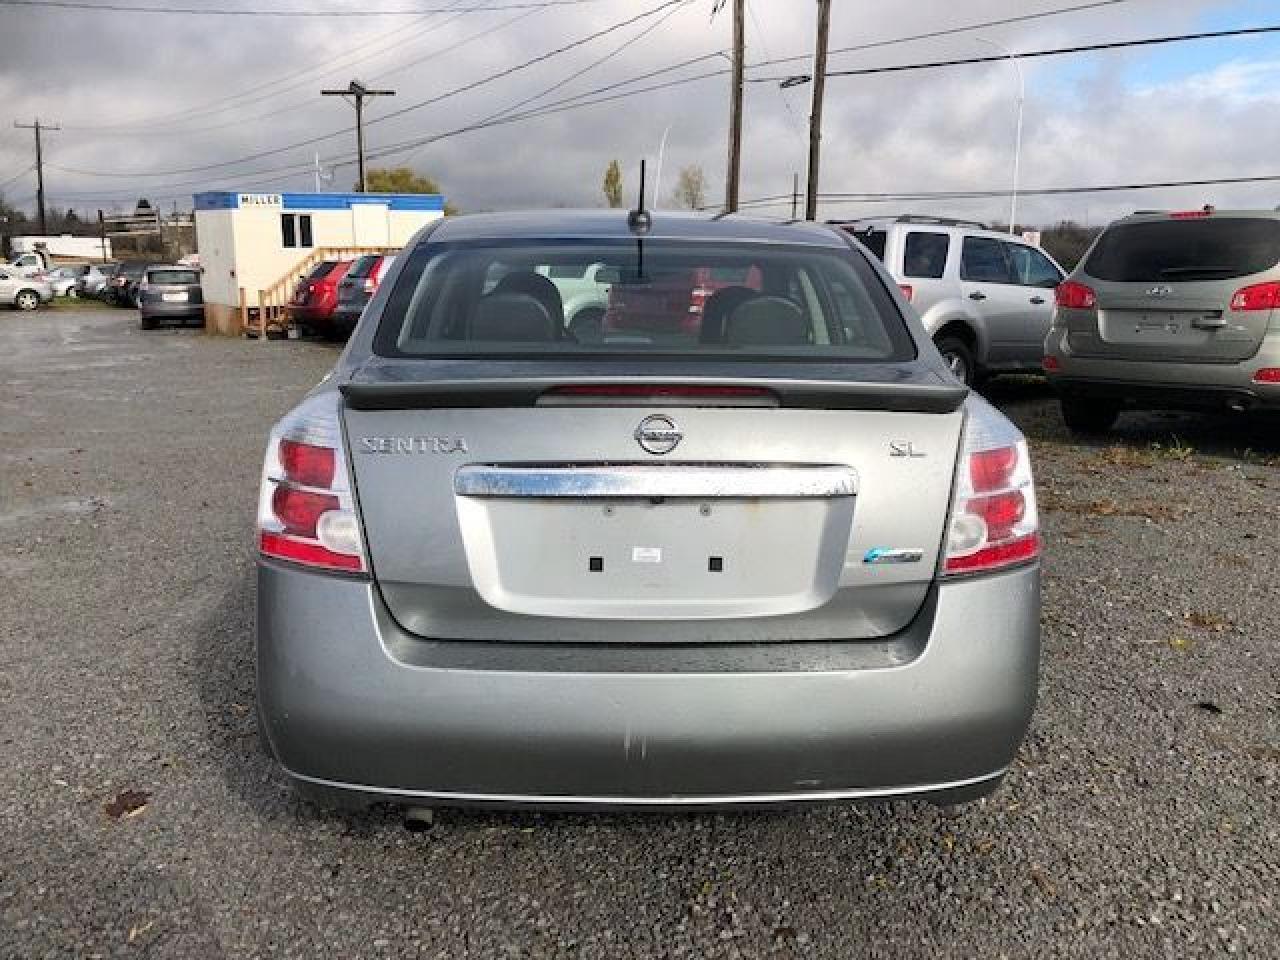 2012 Nissan Sentra SL Leather/ Sunroof/ Navigation/ Back Up Camera/LO